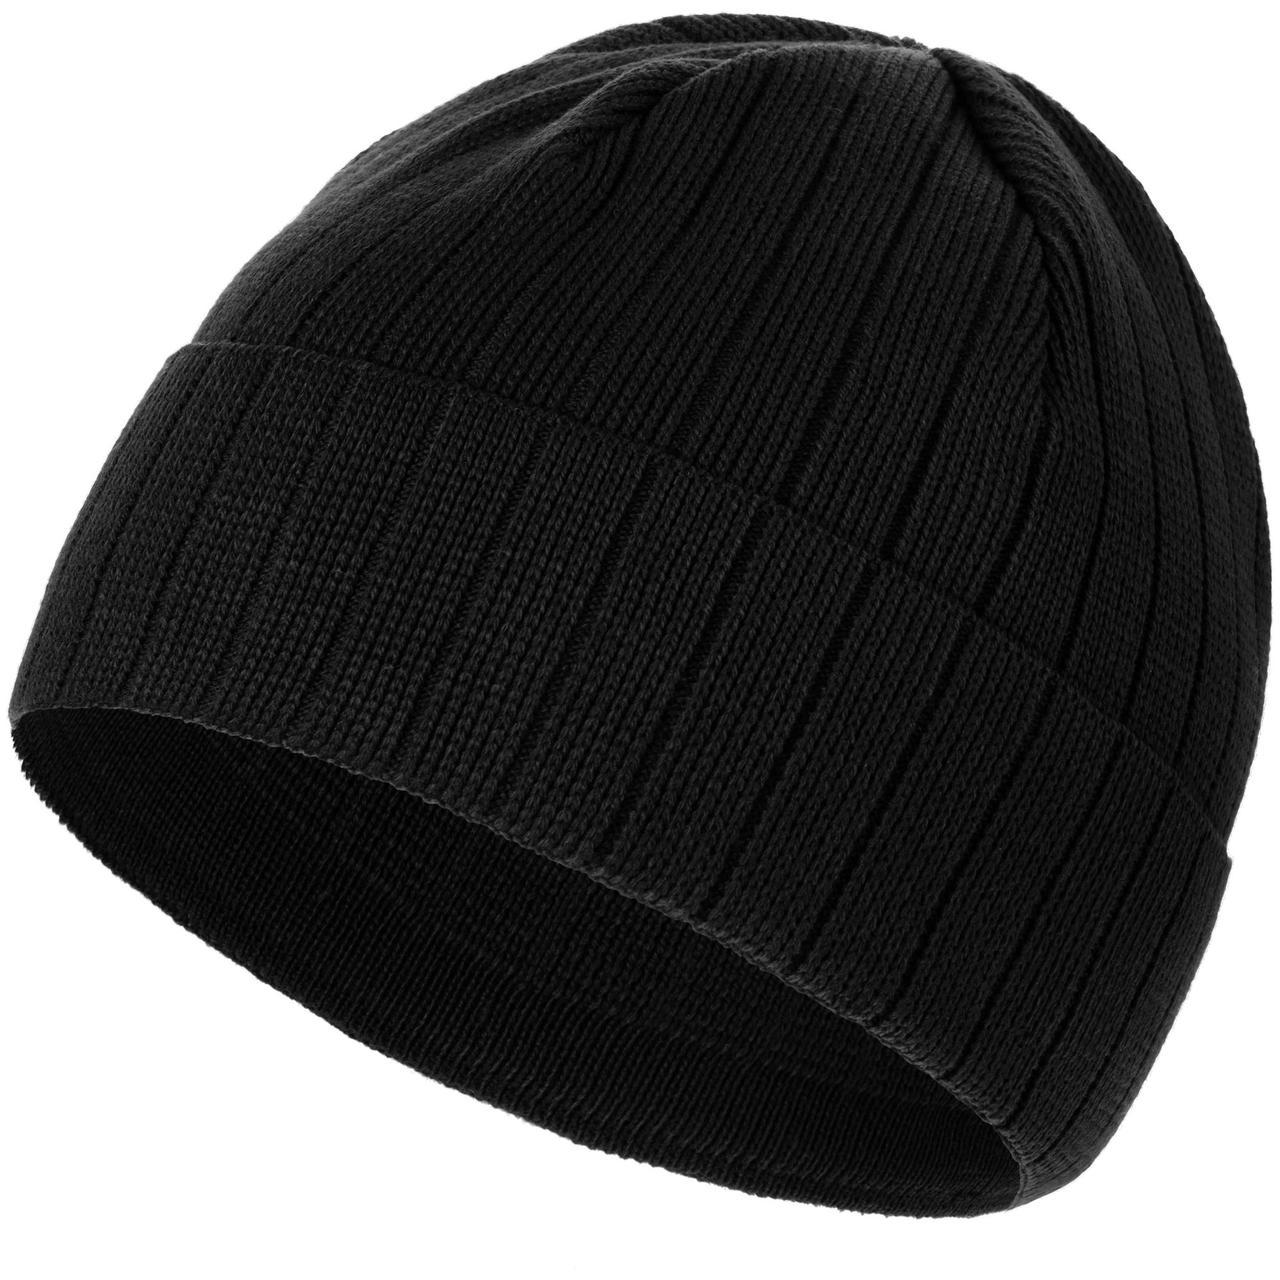 Шапка Lima, черная (артикул 41152.30)